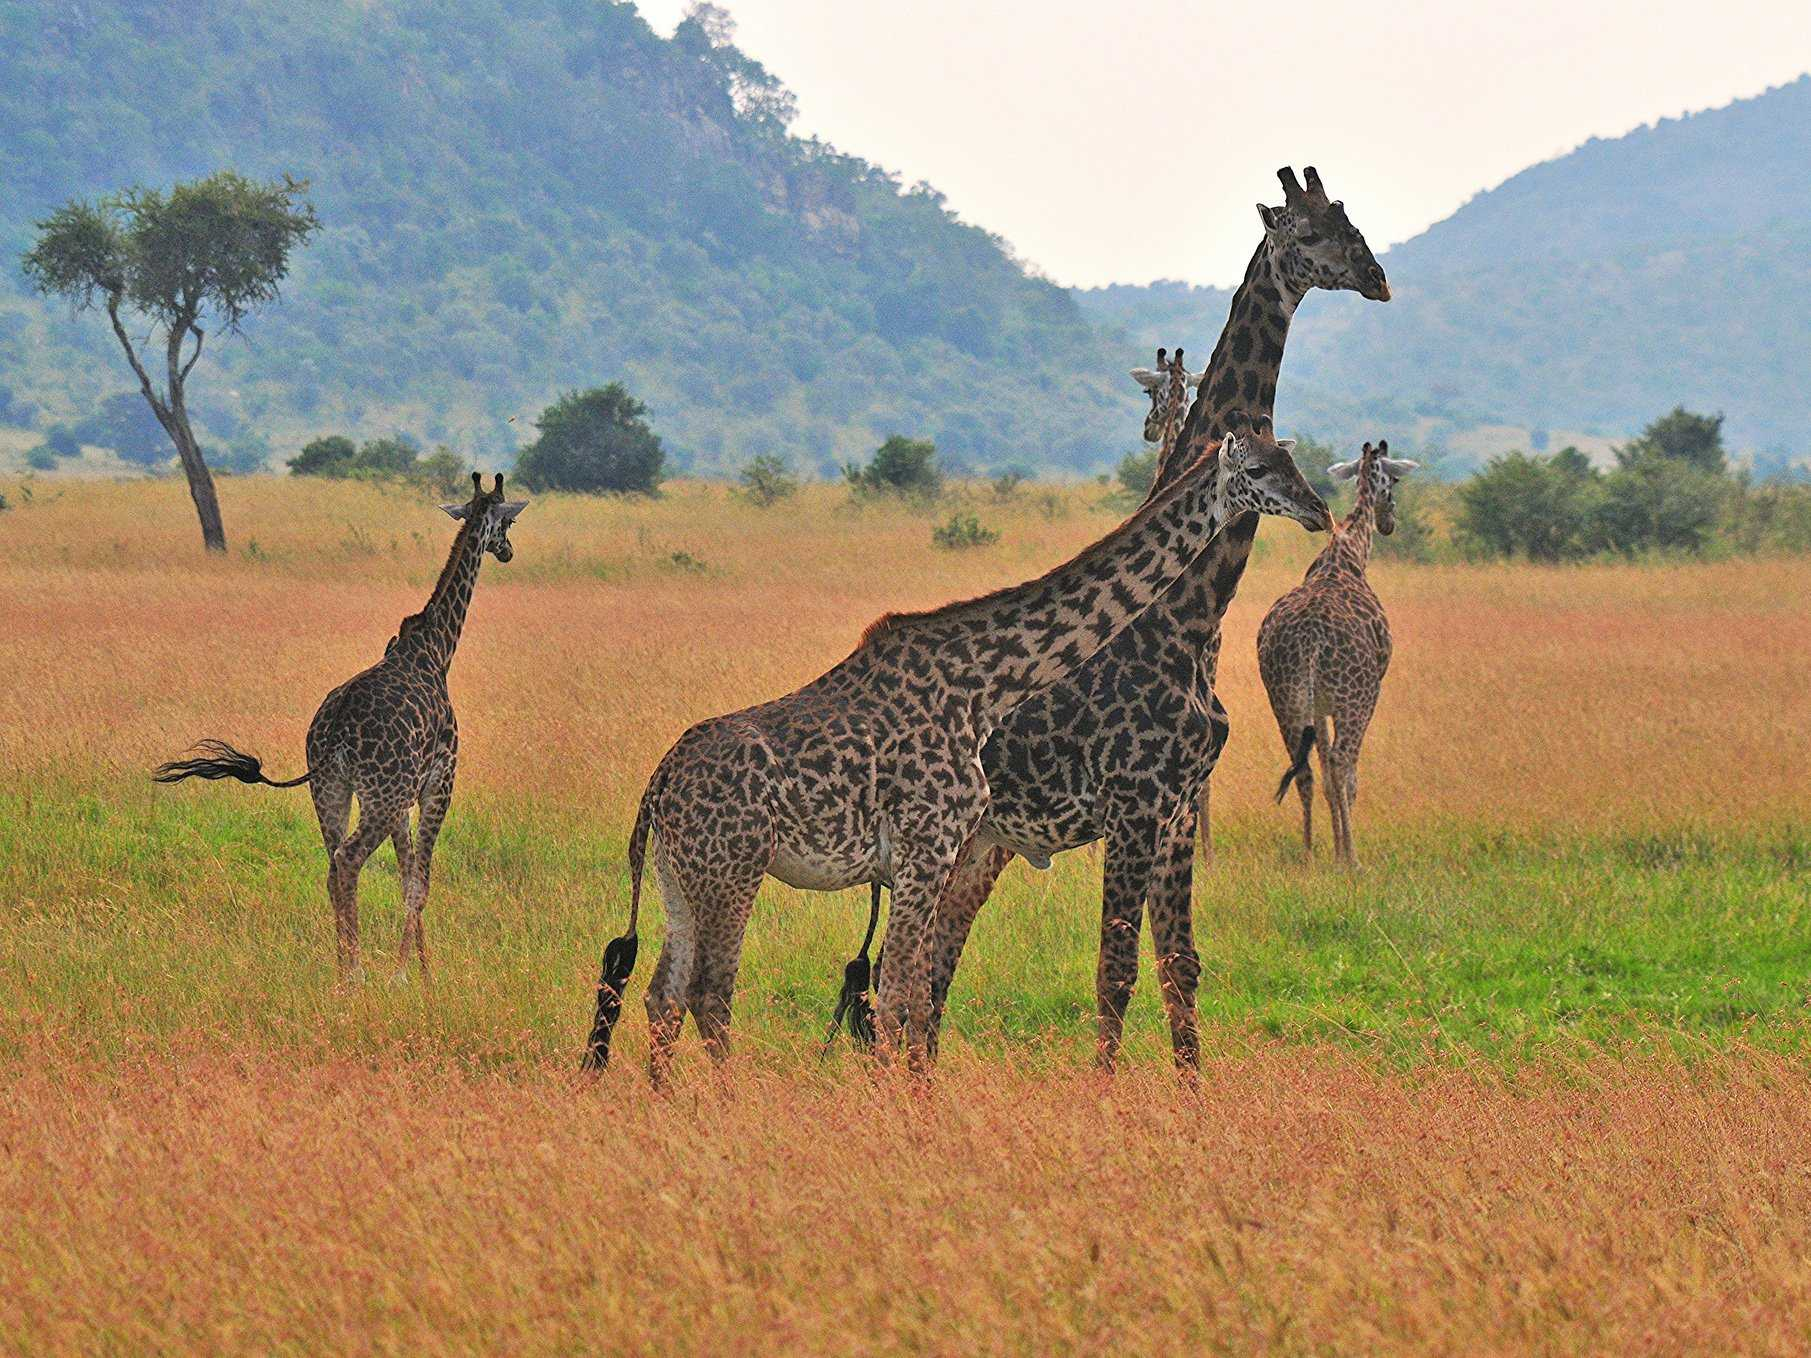 Observe wild animals in their natural habitat on a safari in Kenya.